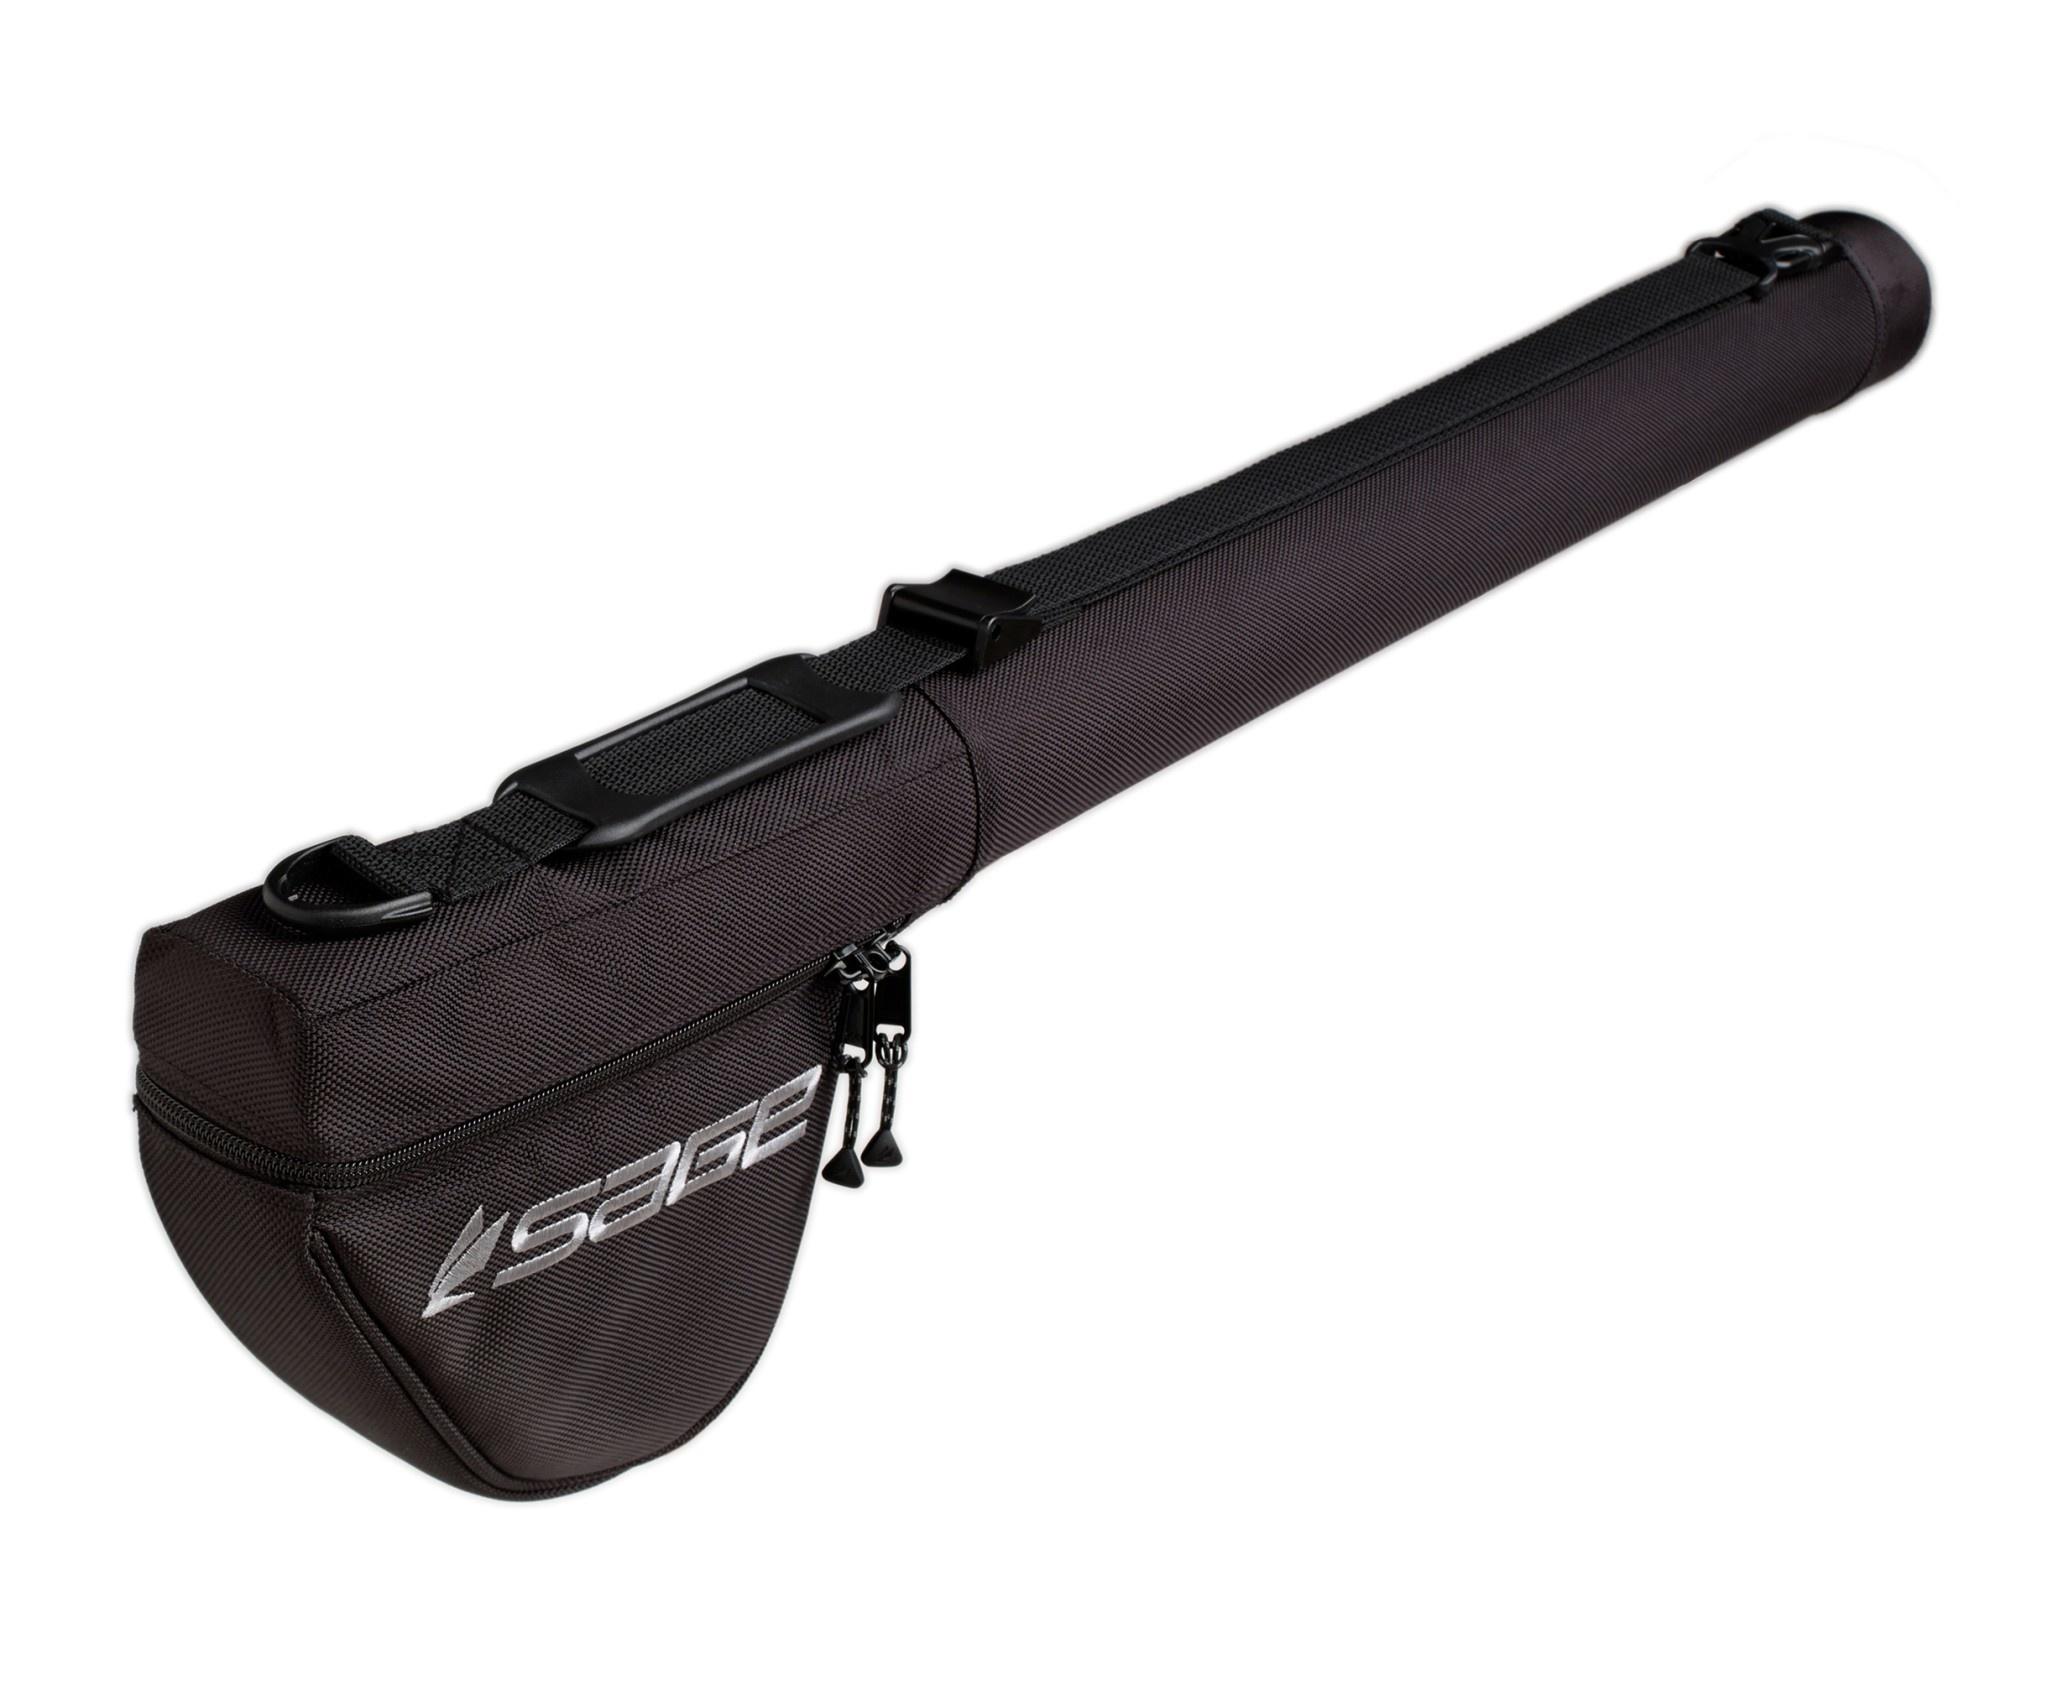 Sage Sage Ballistic Rod/Reel Case, 9' 4pc